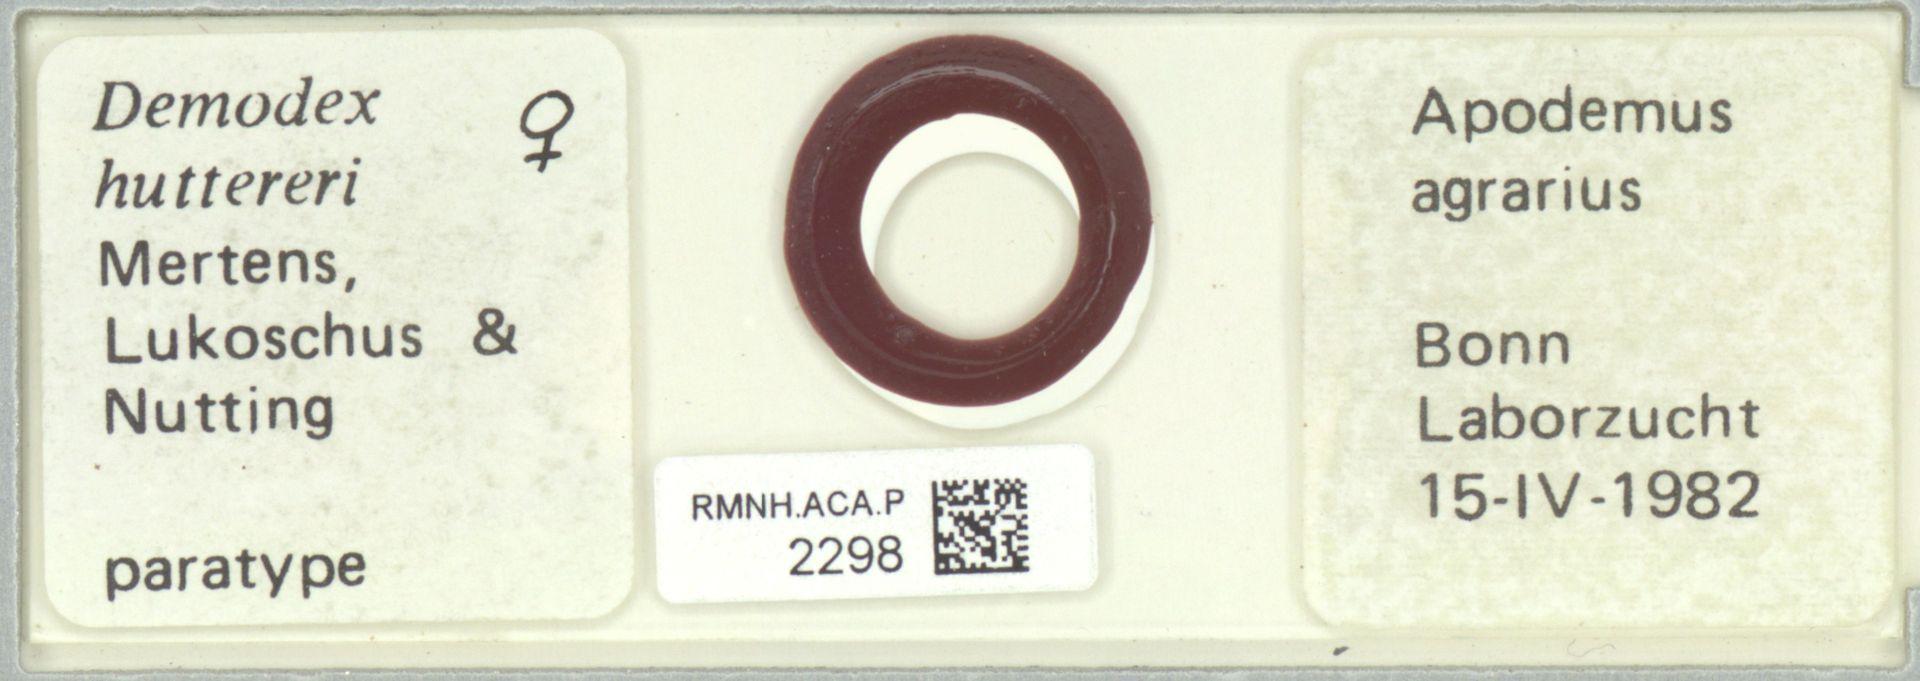 RMNH.ACA.P.2298 | Demodex hutteri Mertens, Lukoschus & Nutting